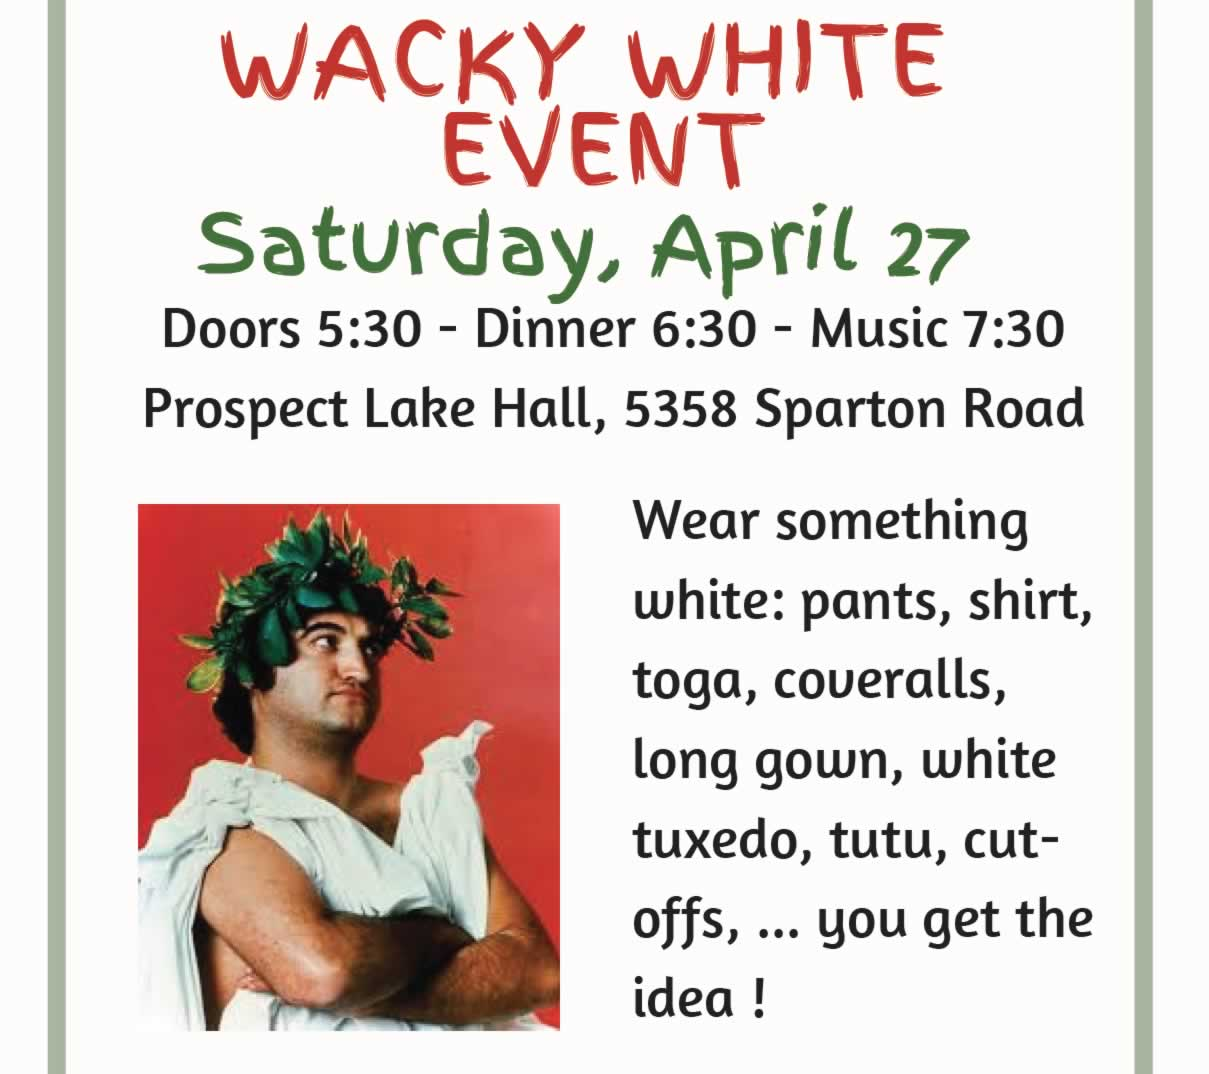 Wacky White Dinner Sat April 27th